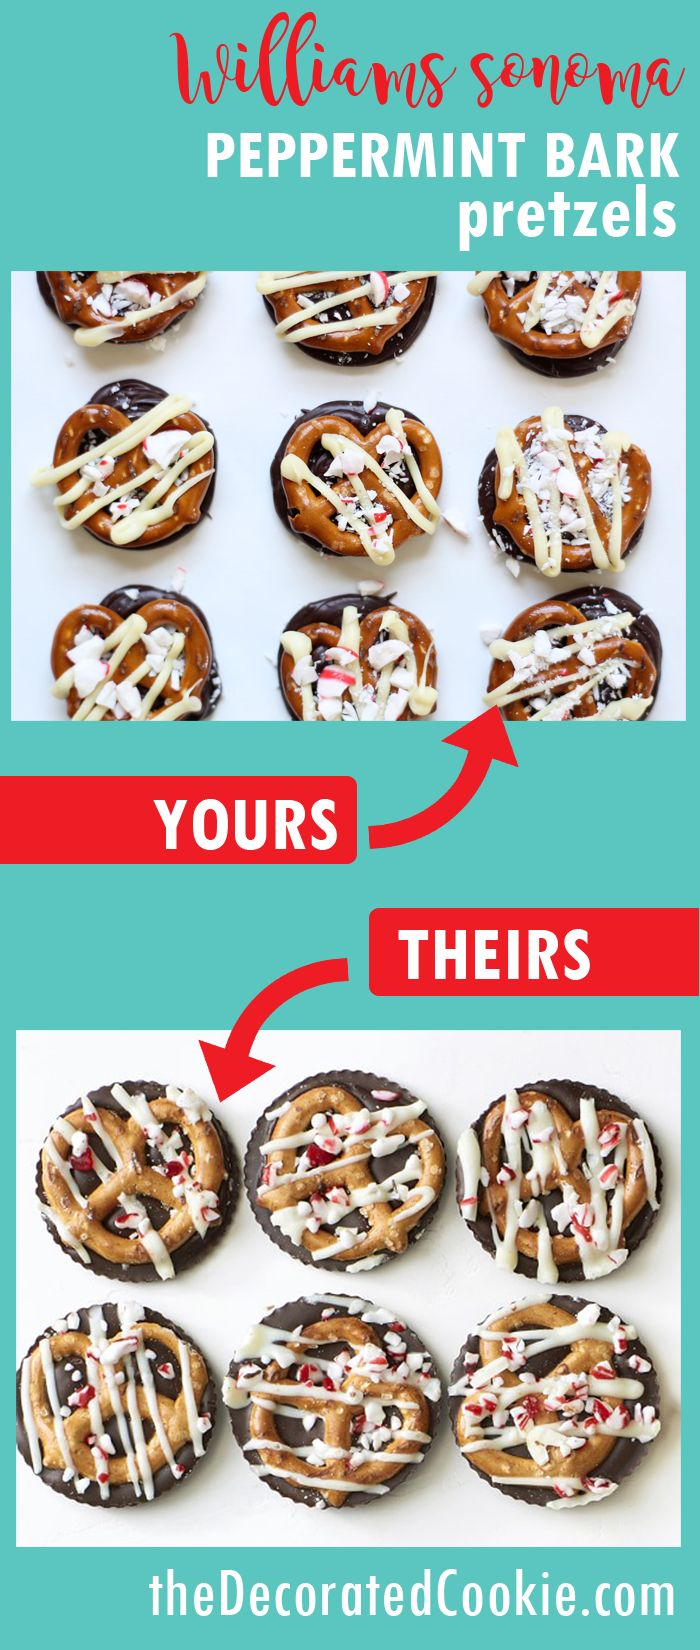 copycat Williams Sonoma peppermint bark pretzels, a delicious, easy homemade Christmas gift idea